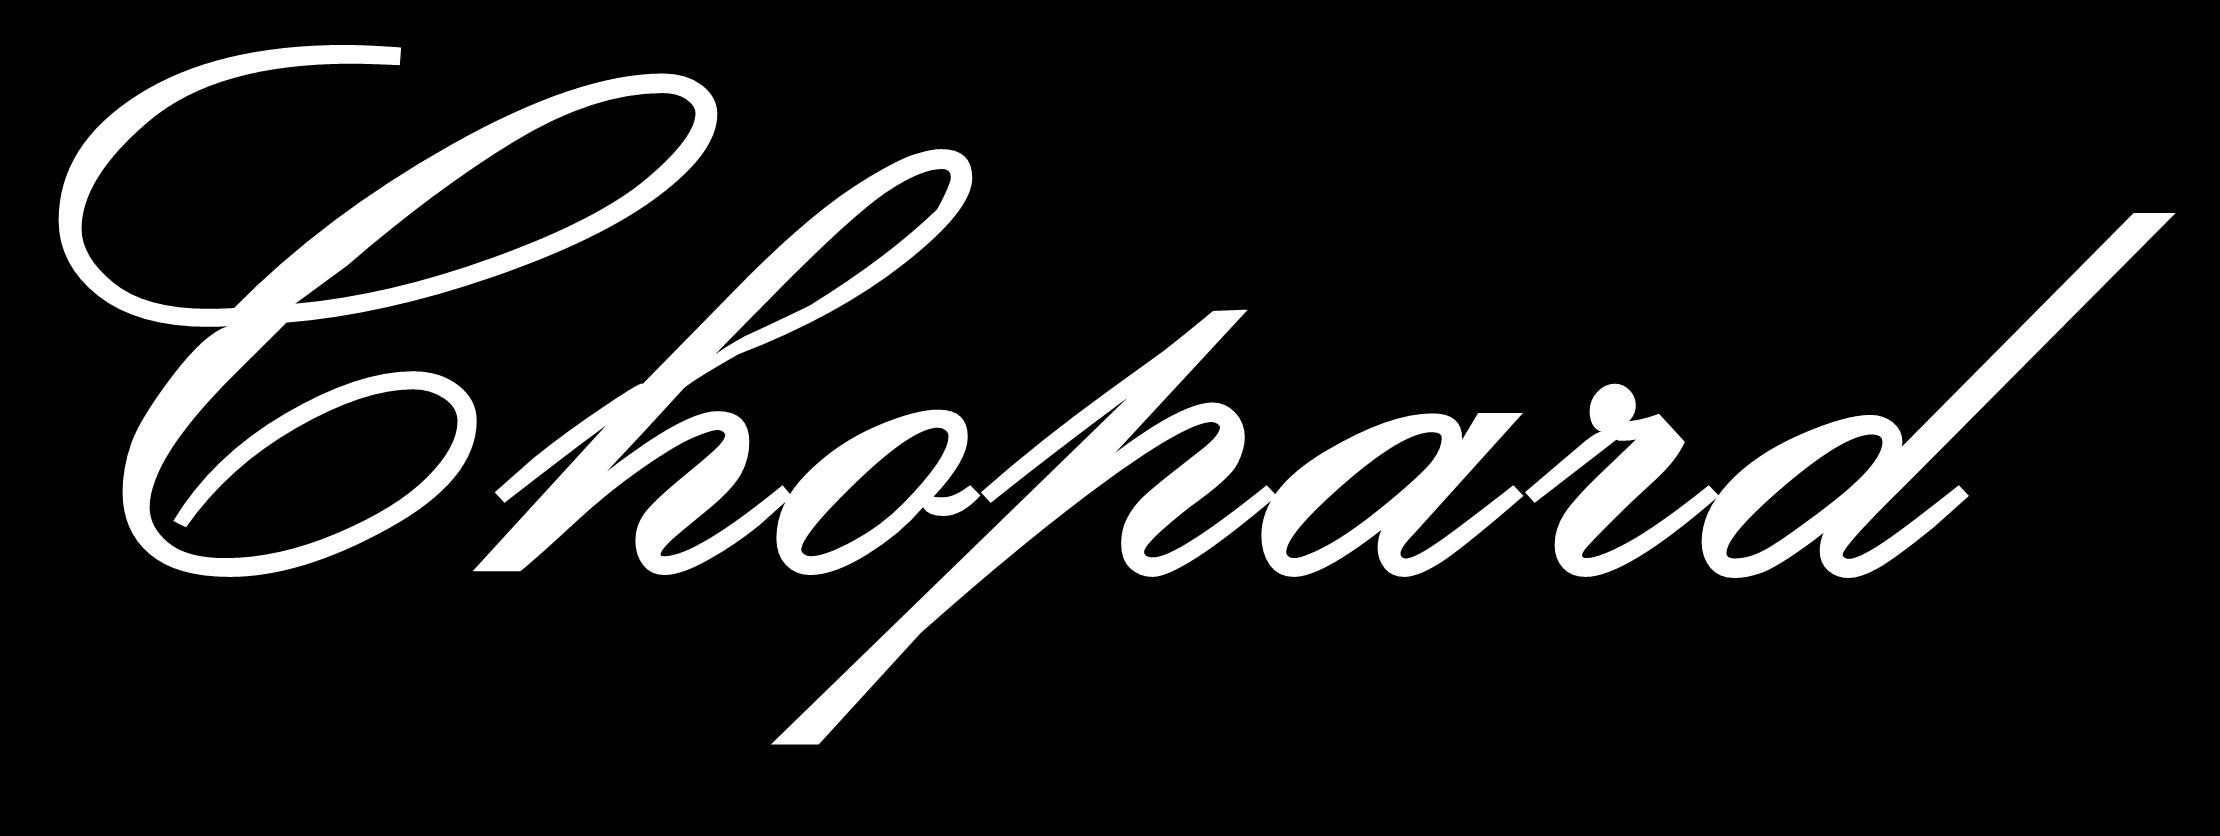 Ralph Lauren Wallpaper Hd 20 Luxury Watch And Jewelry Brands Amp Their Pronunciation